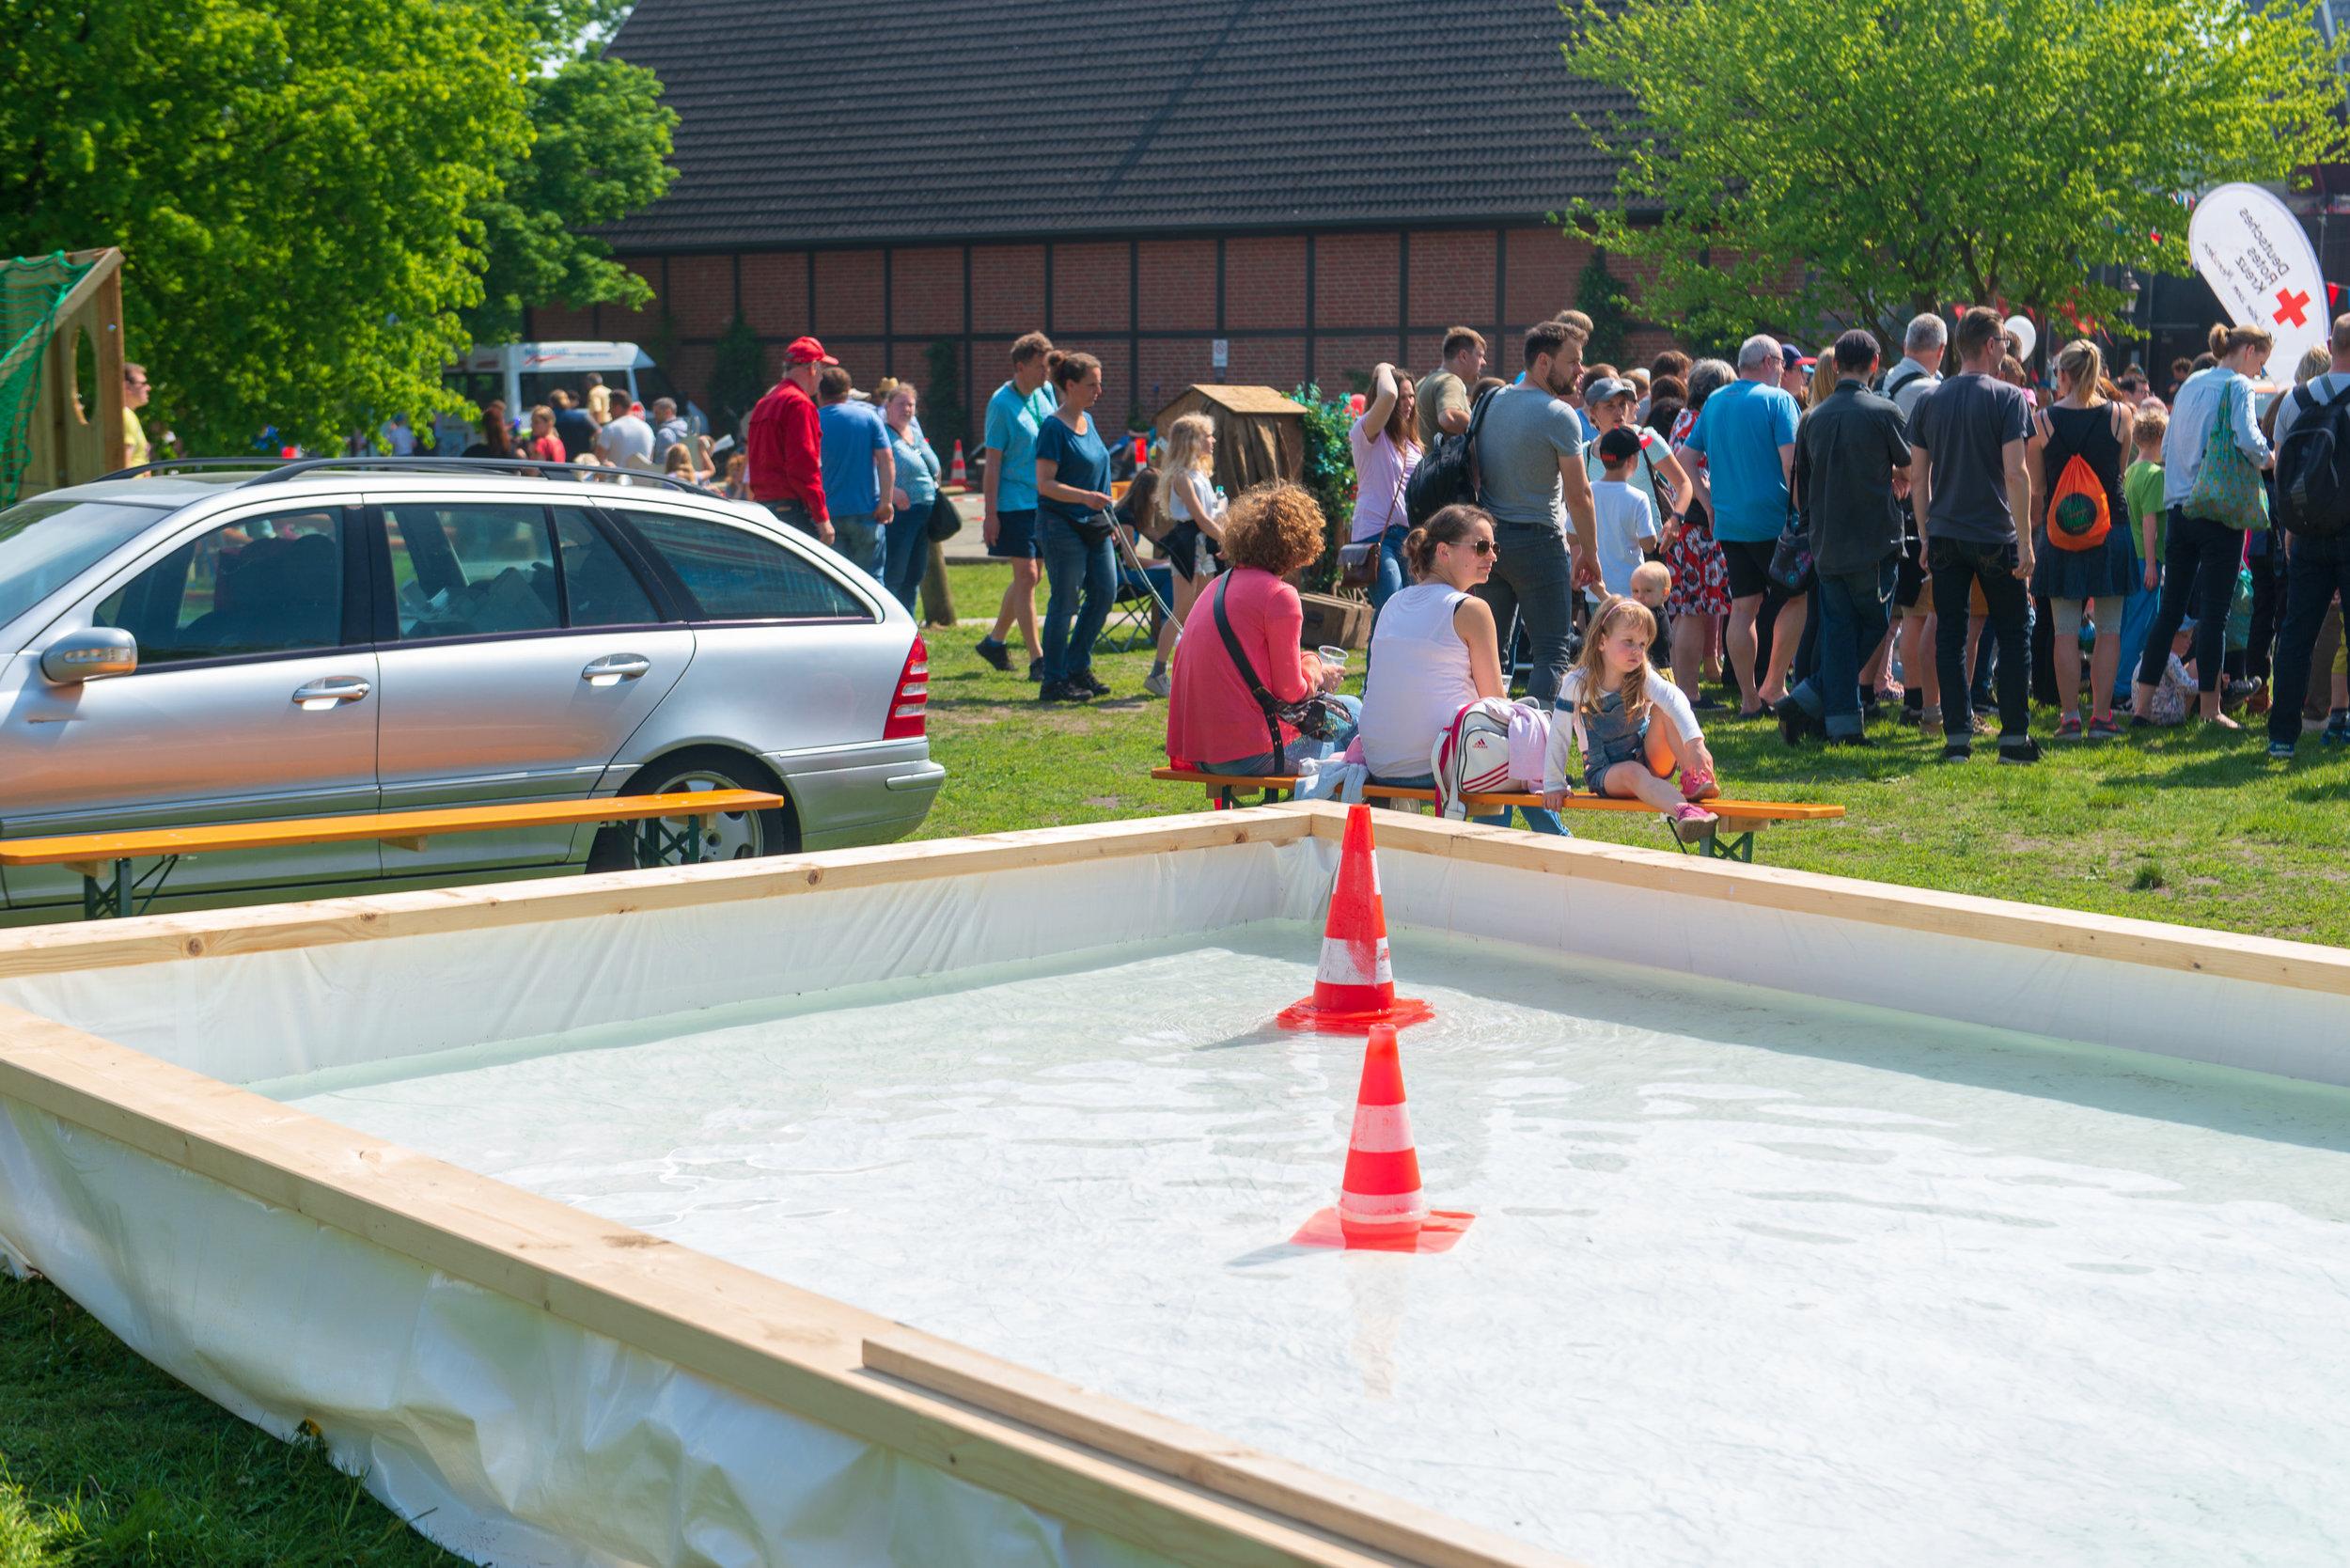 13-Norderstedter-Museumsfest-2019-FWM--XO-Dennys-Mamero-WEB-30.jpg